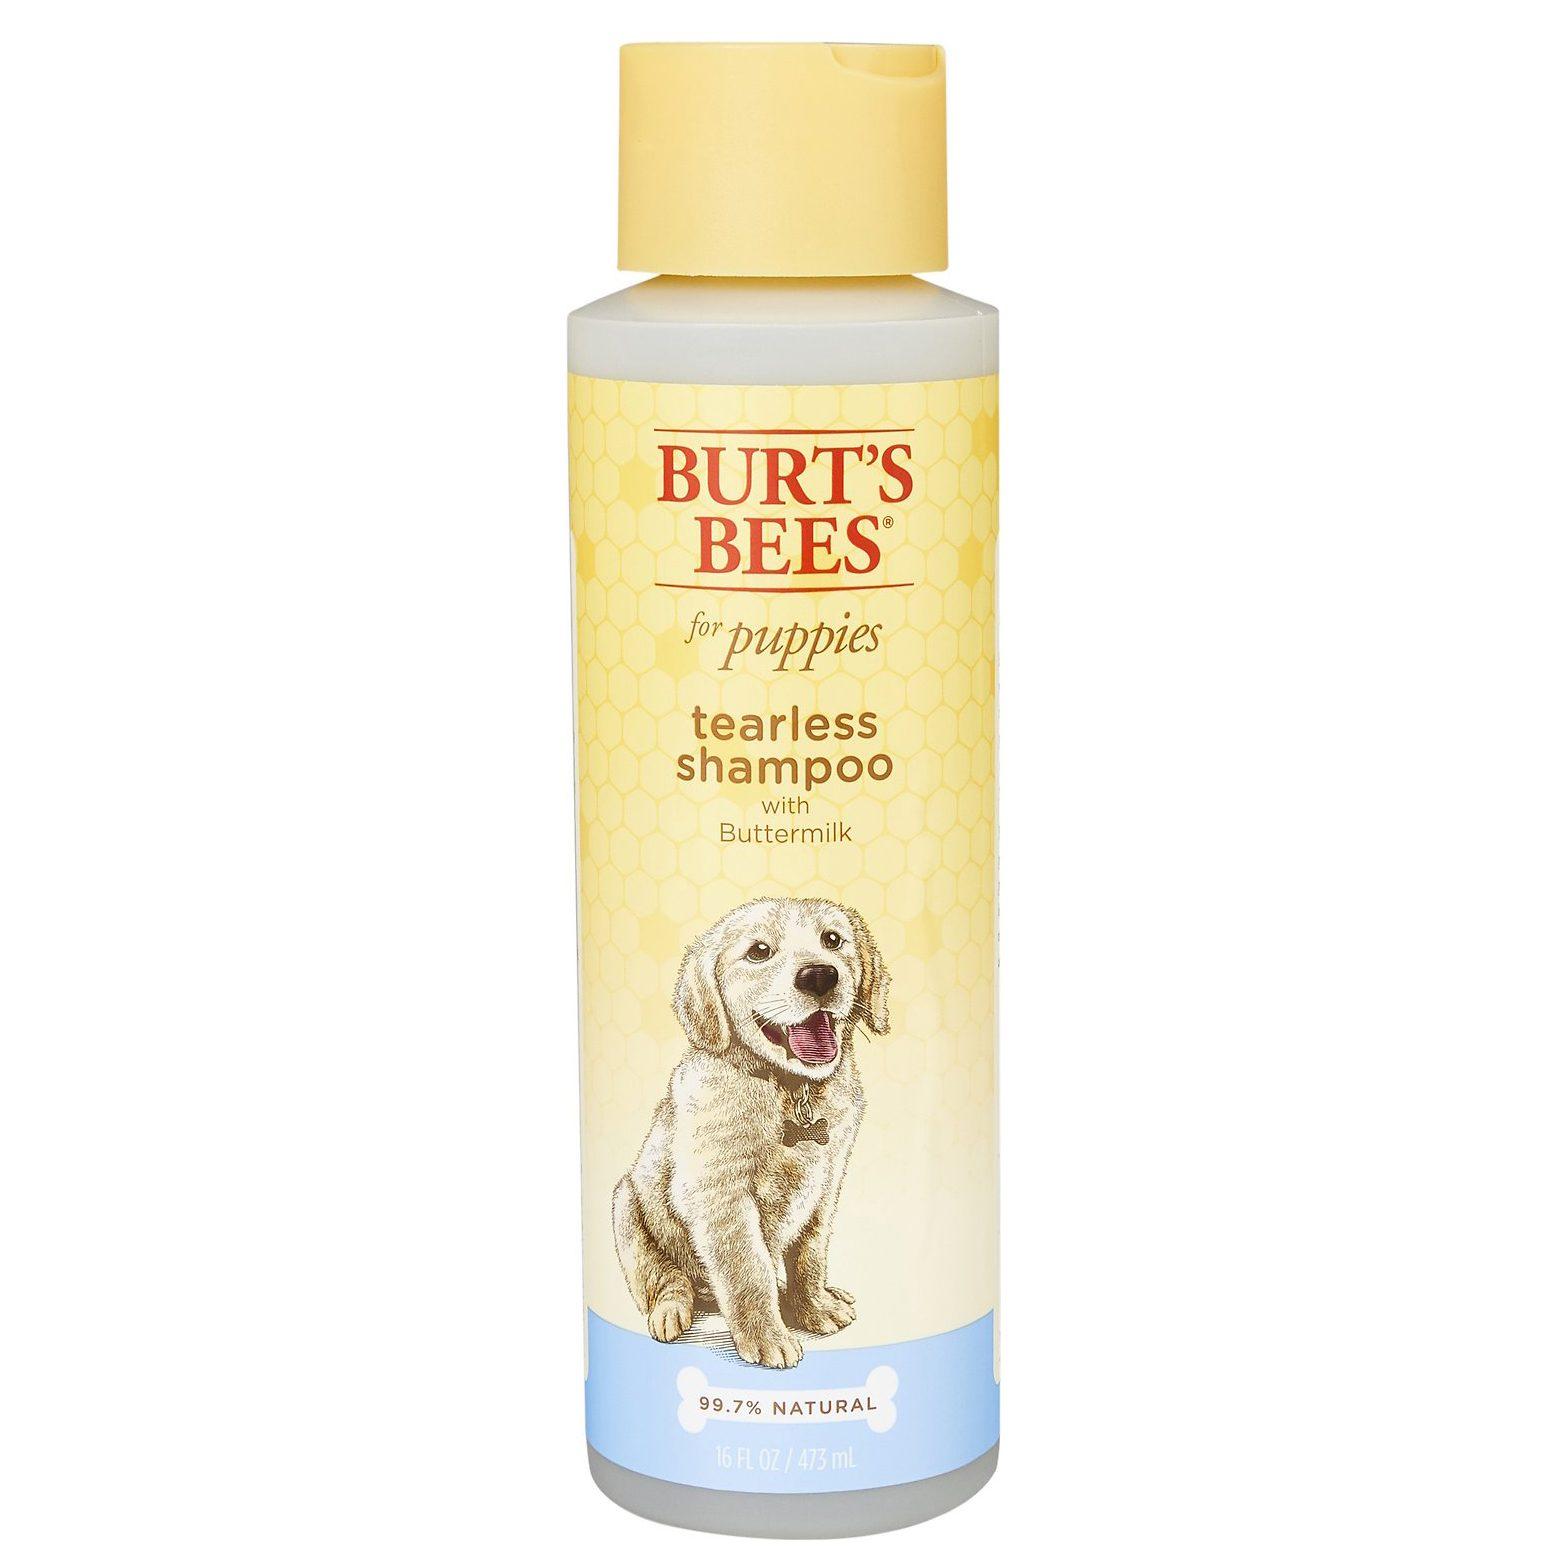 burts bees dog shampoo